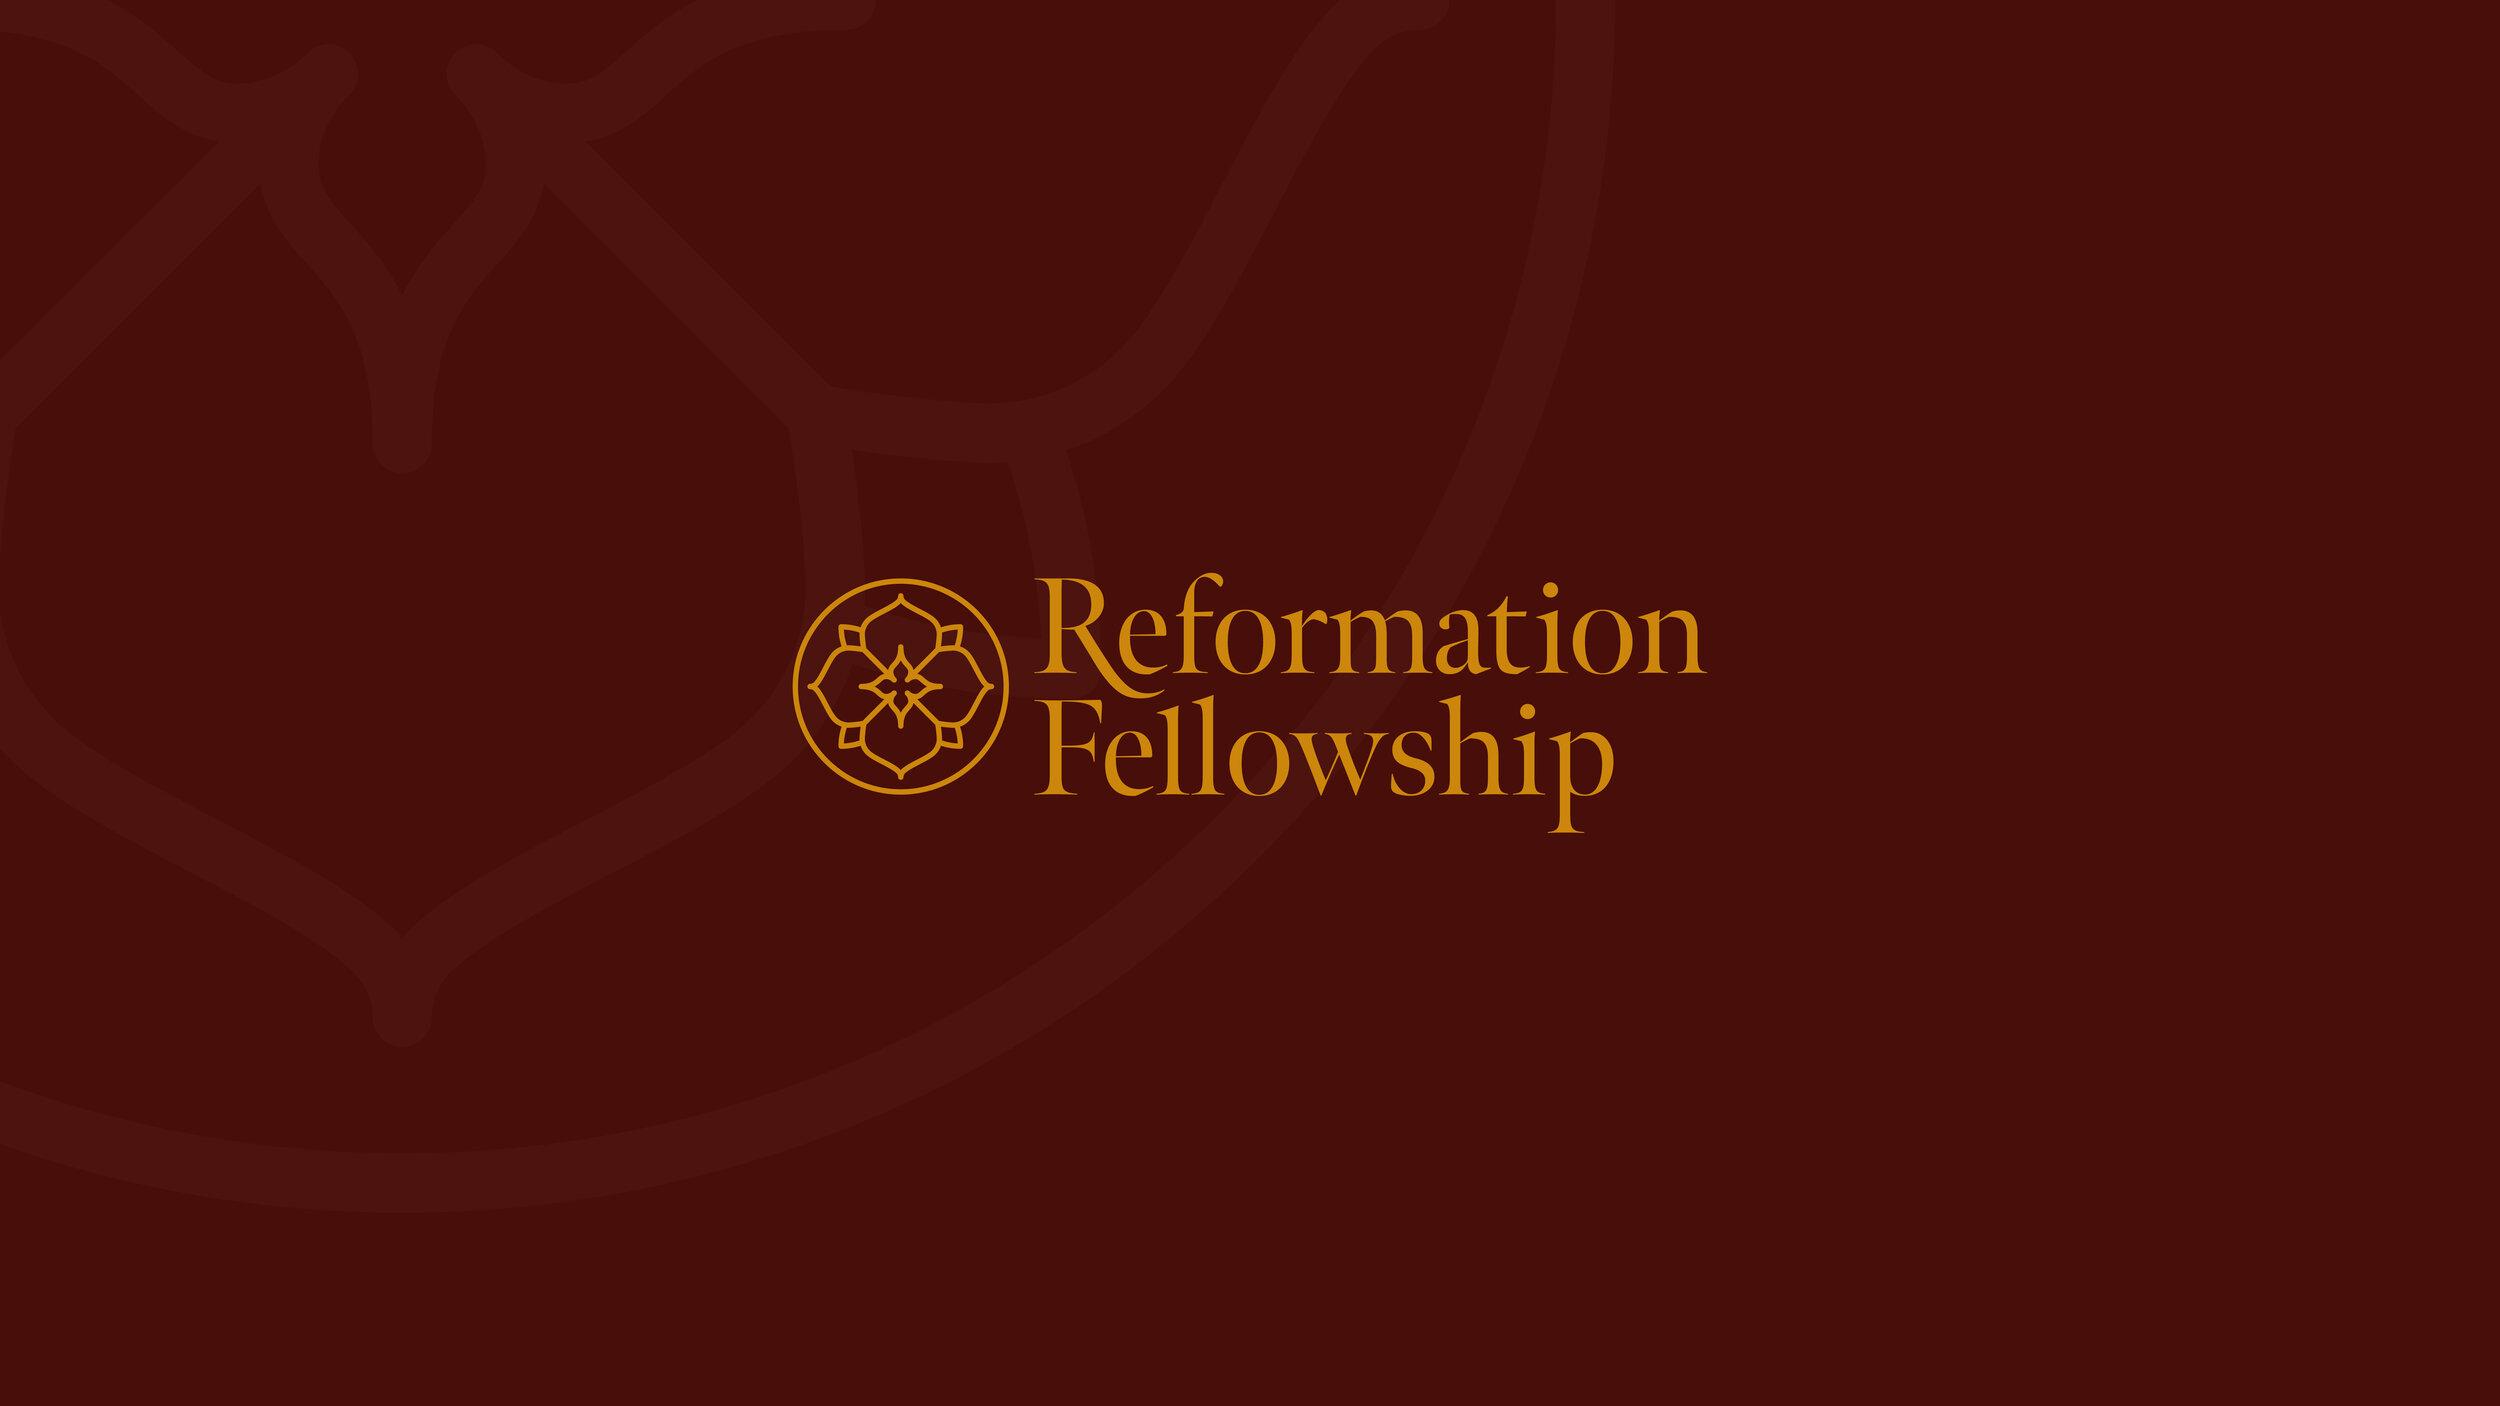 Reformation Fellowship — Union